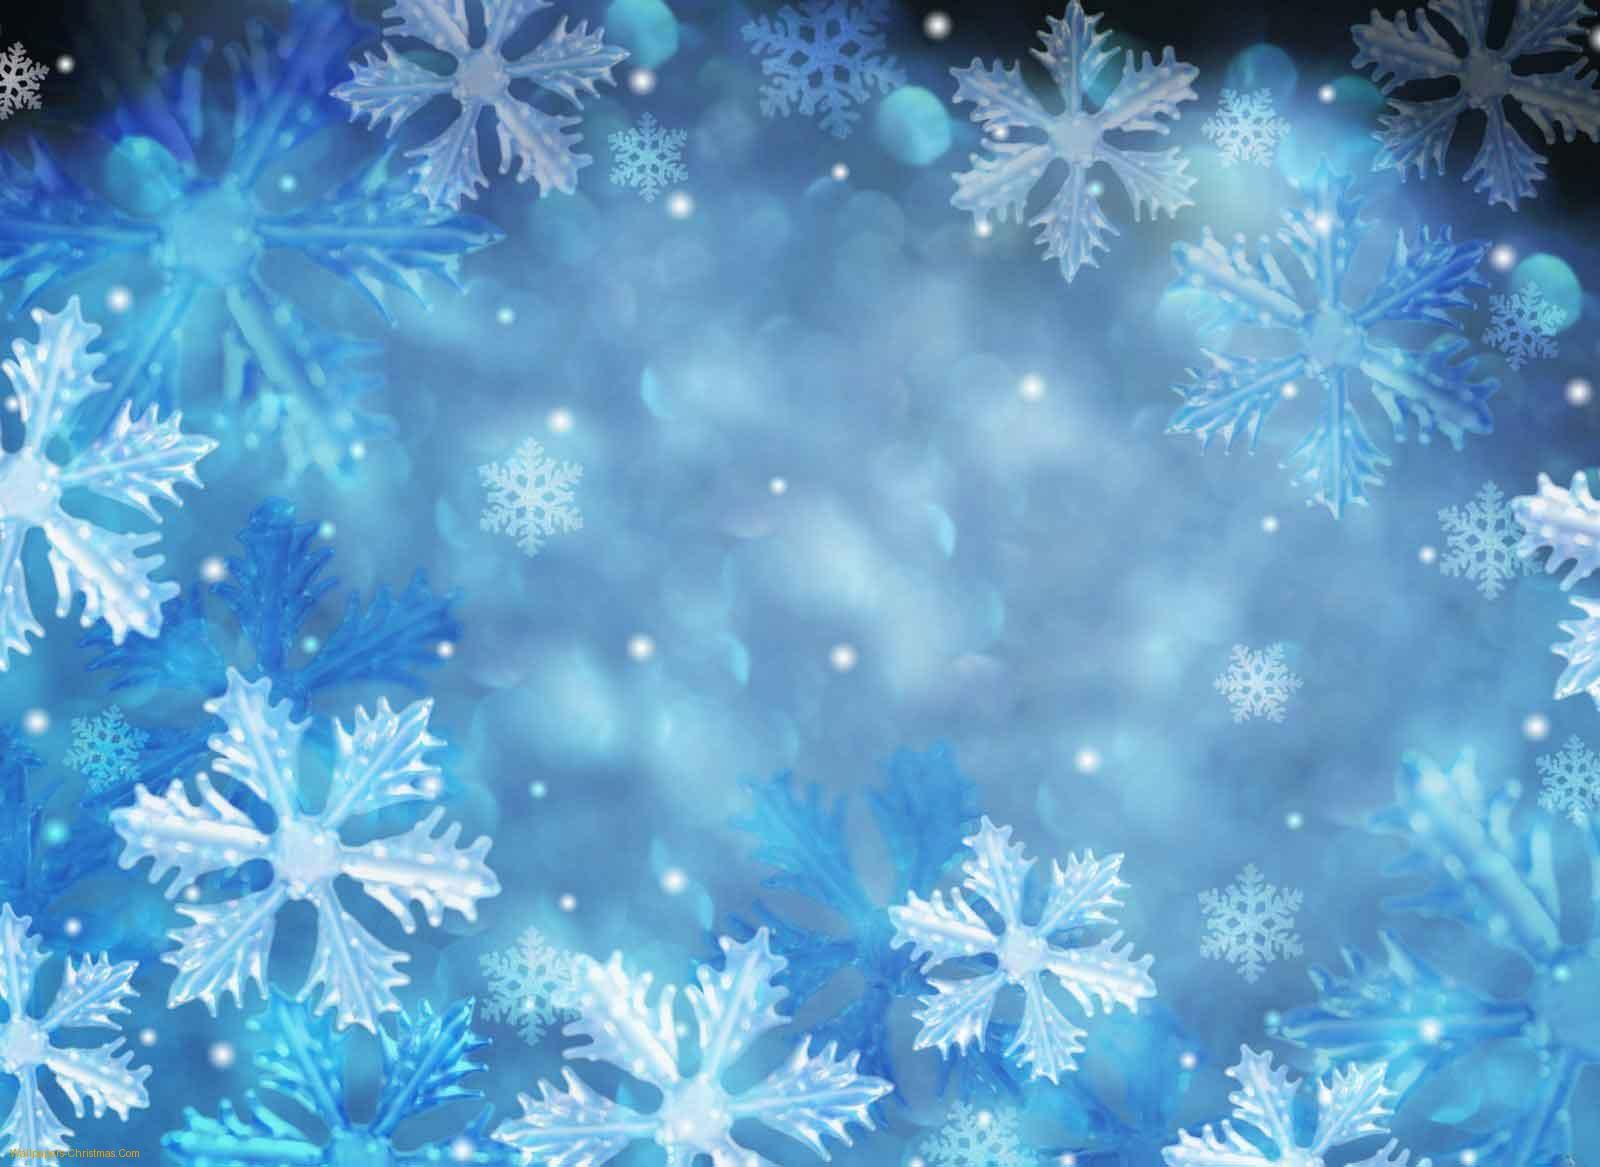 ilona wallpapers beautiful snowy - photo #43